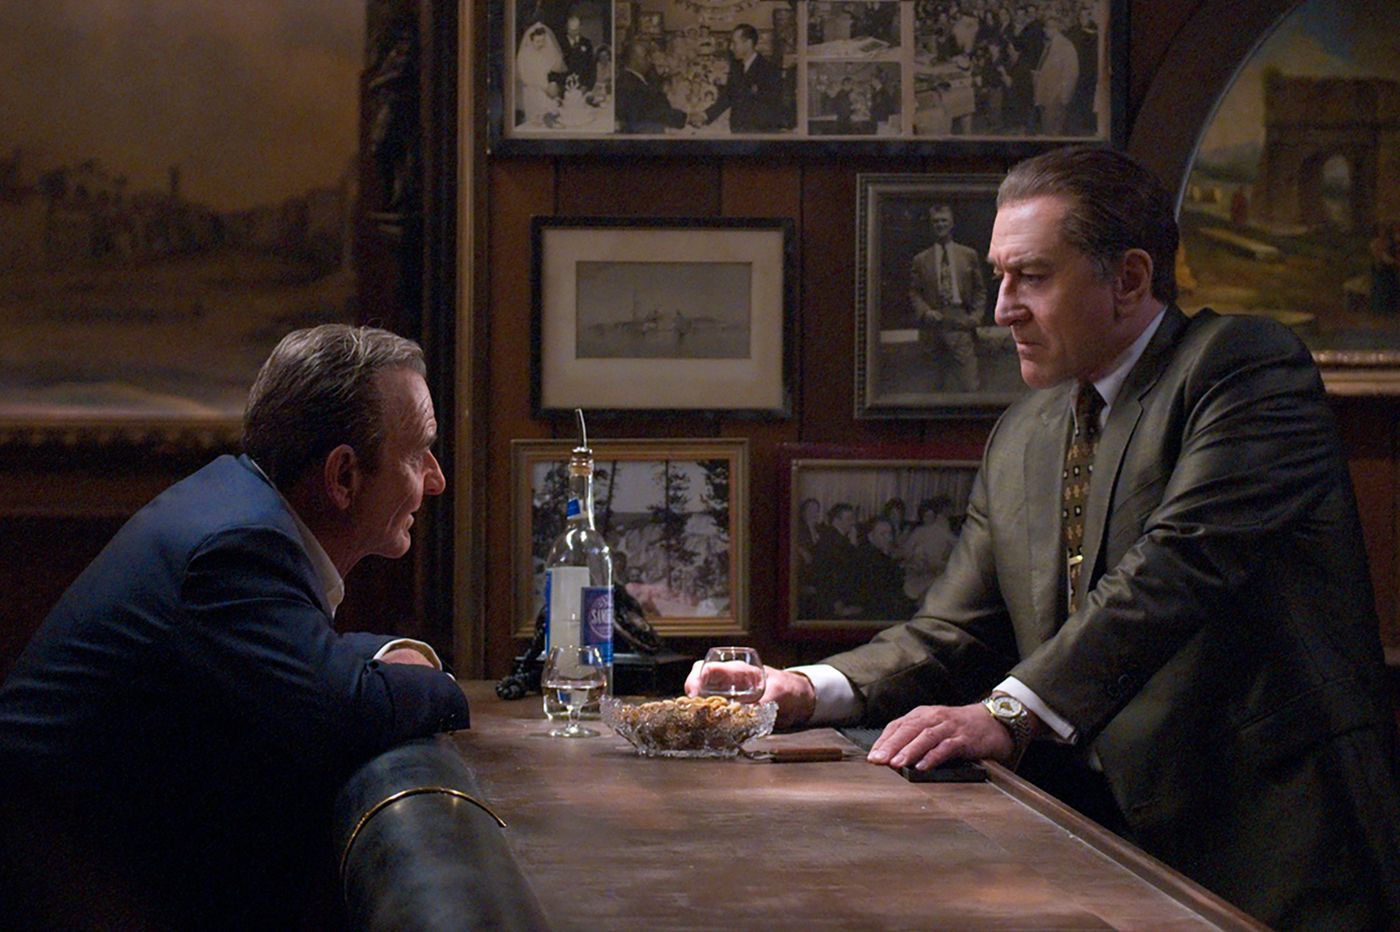 'The Irishman': The real people behind Martin Scorsese's Philadelphia mob movie